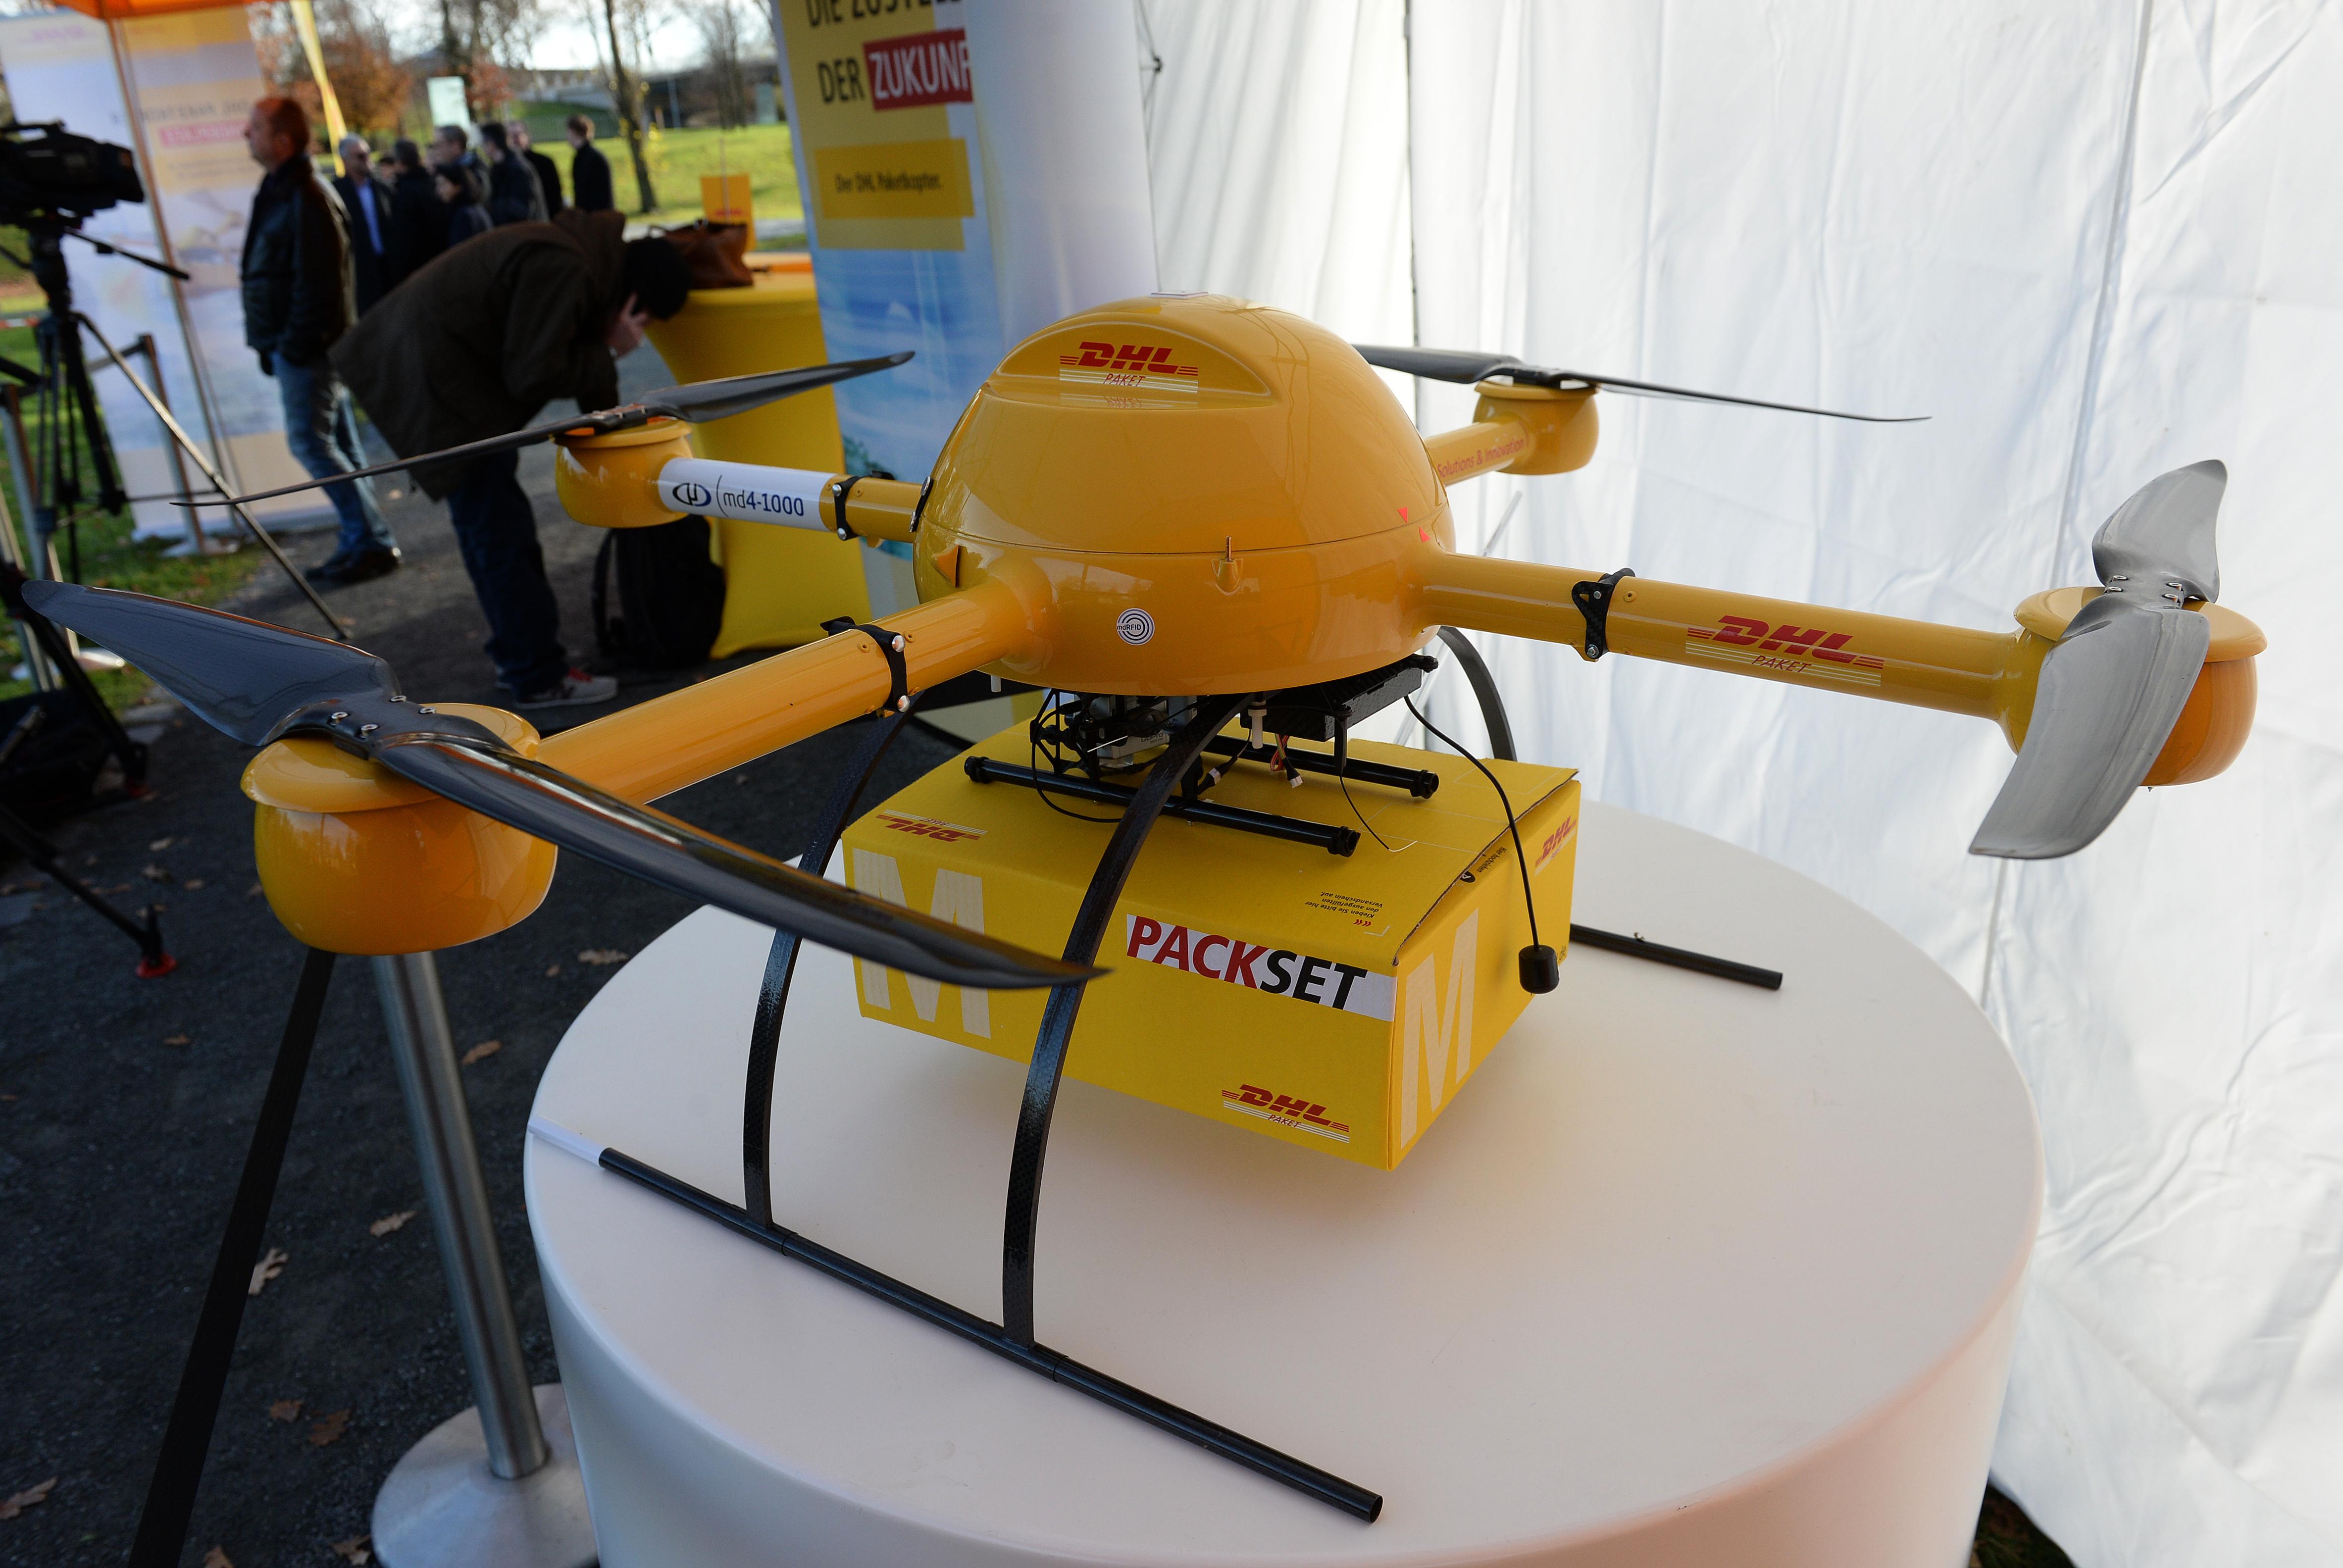 GERMANY-COMPANY-LOGISTICS-POST-DRONE